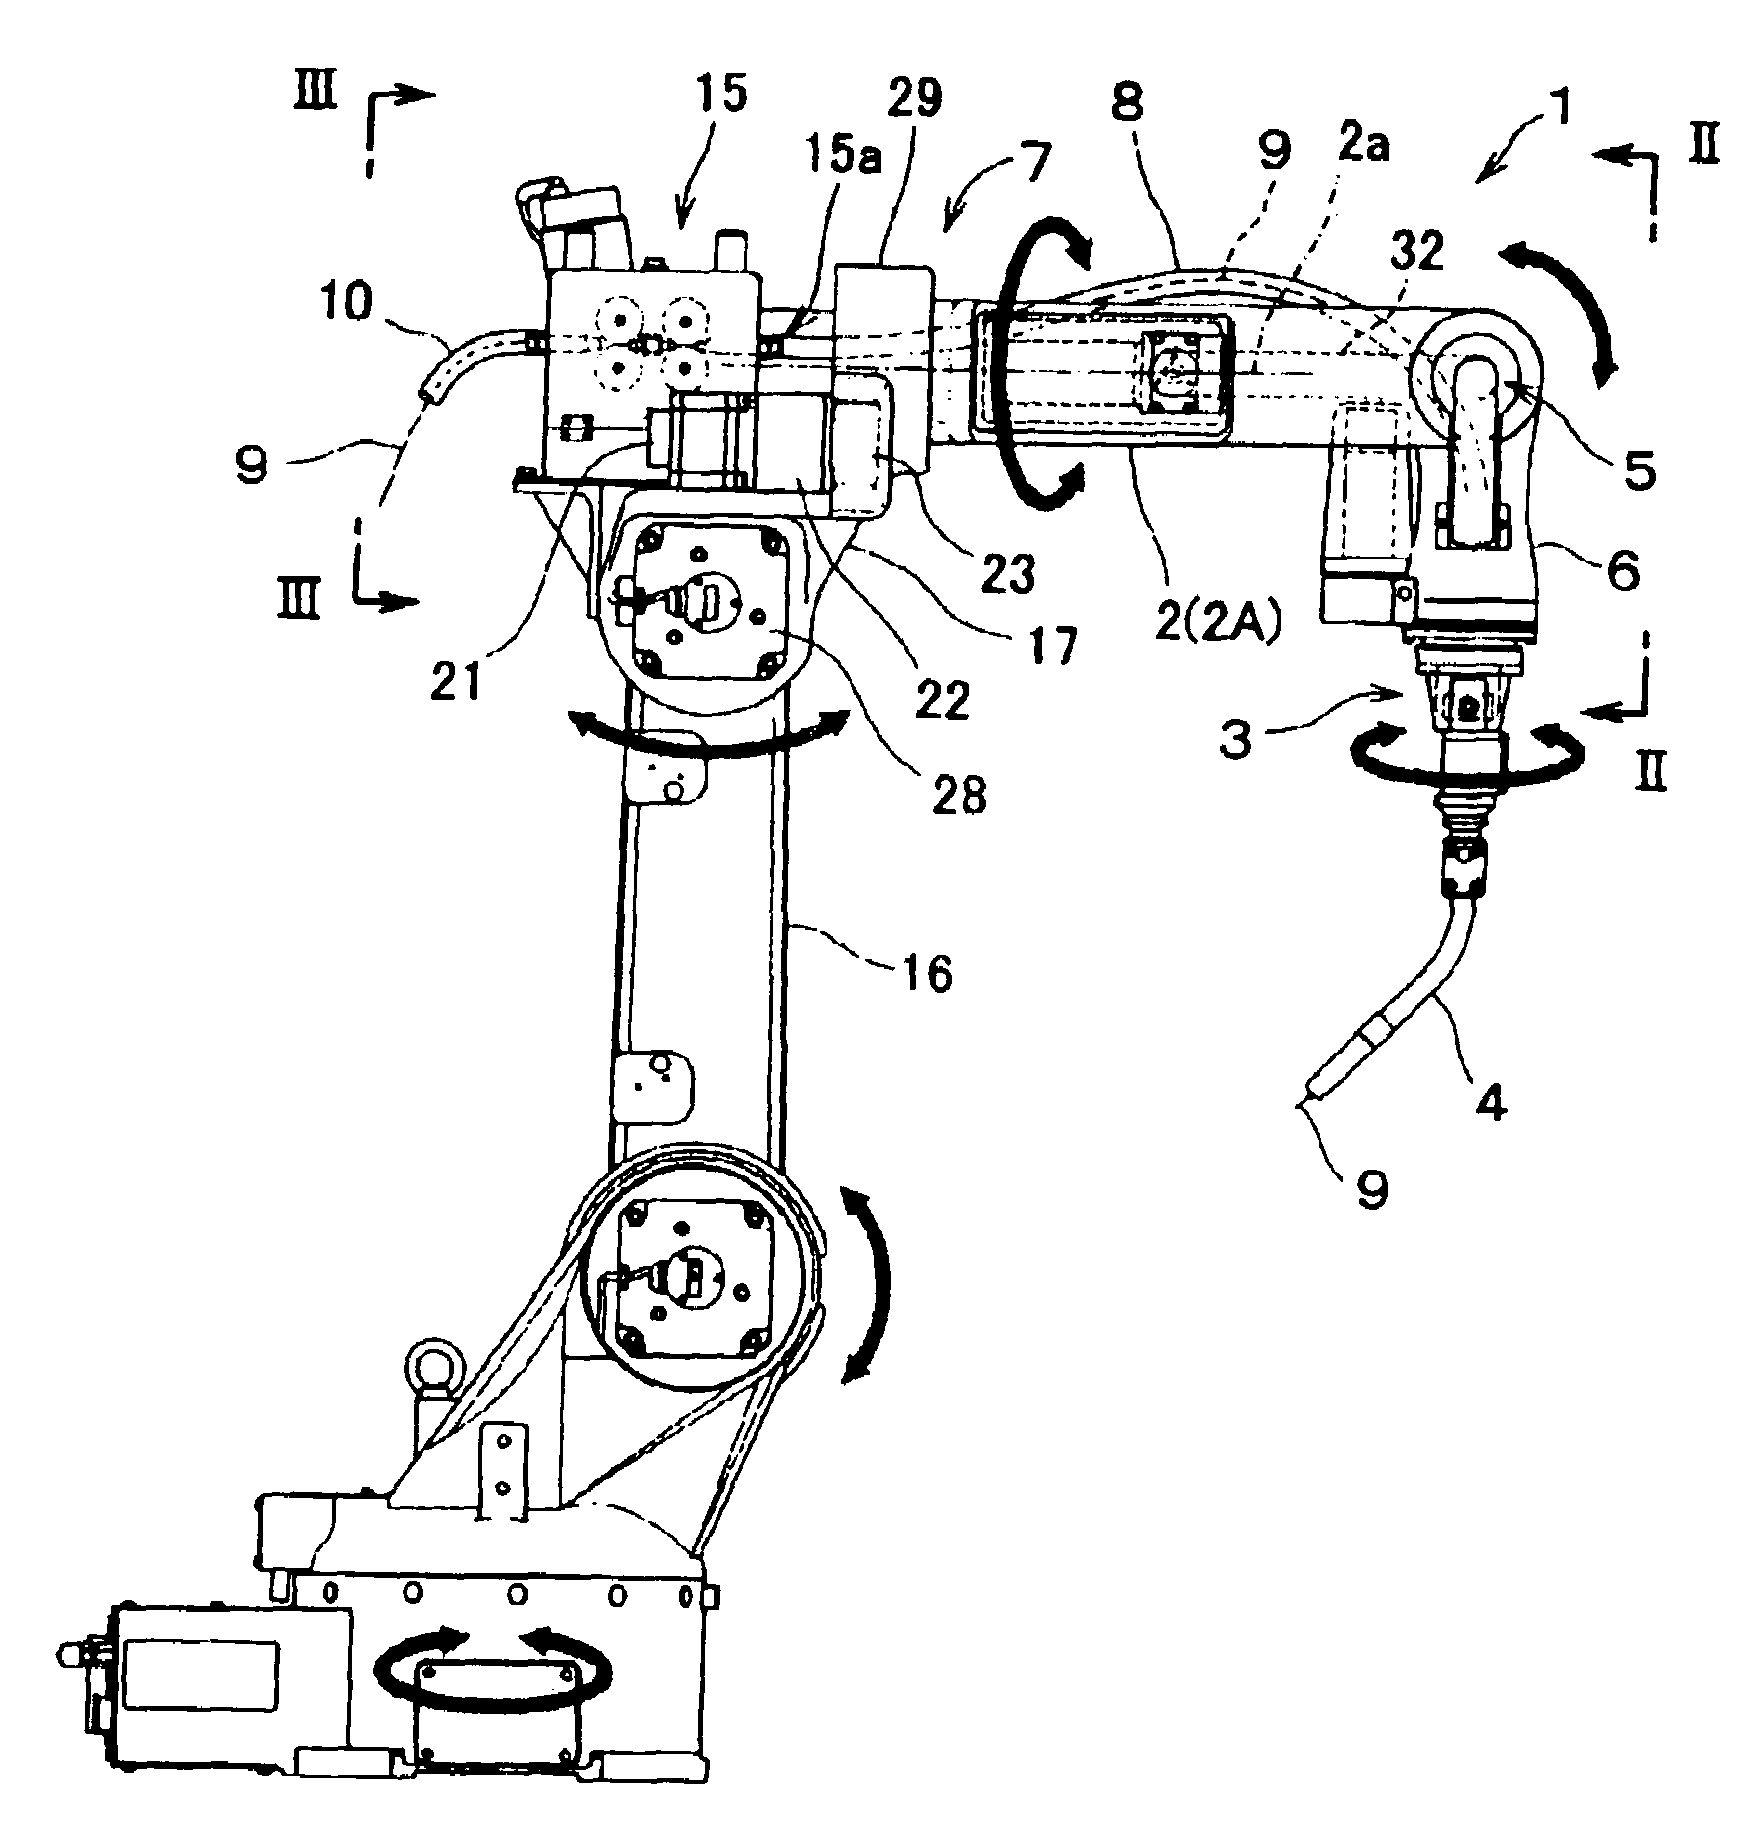 Factory Robot Arm